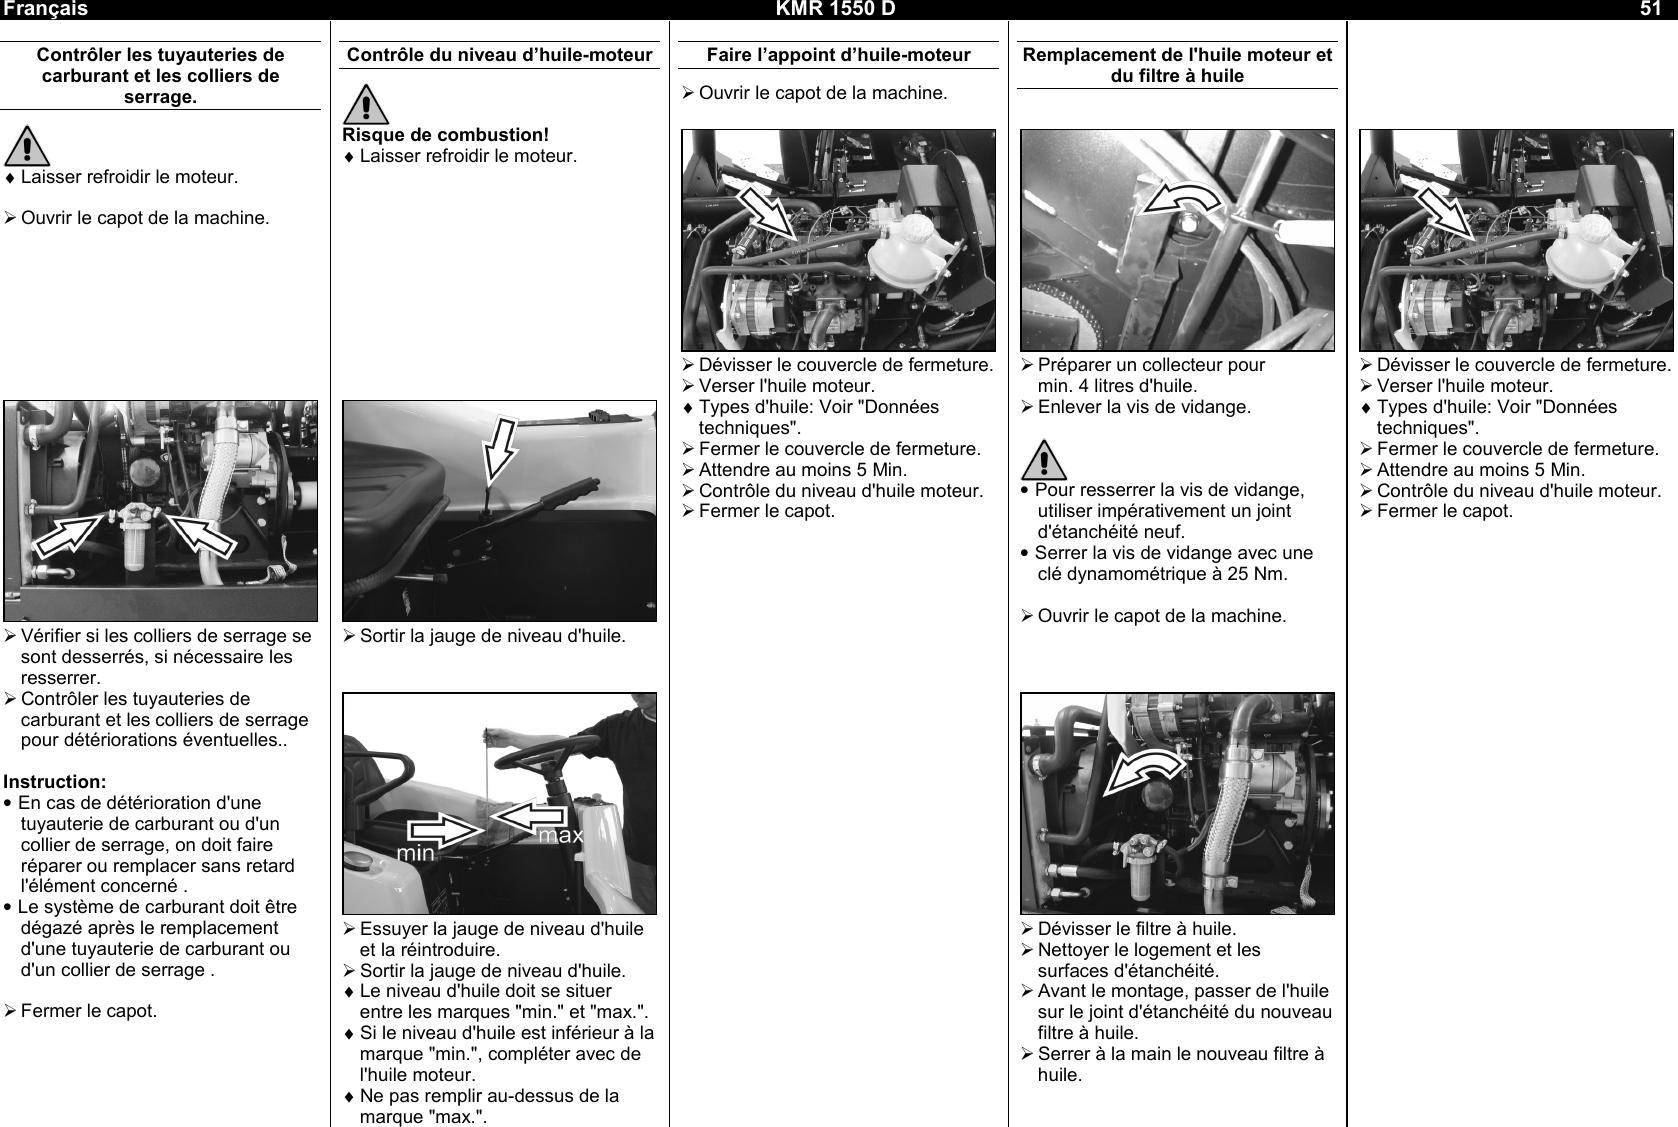 Karcher Kmr 1550 D Users Manual